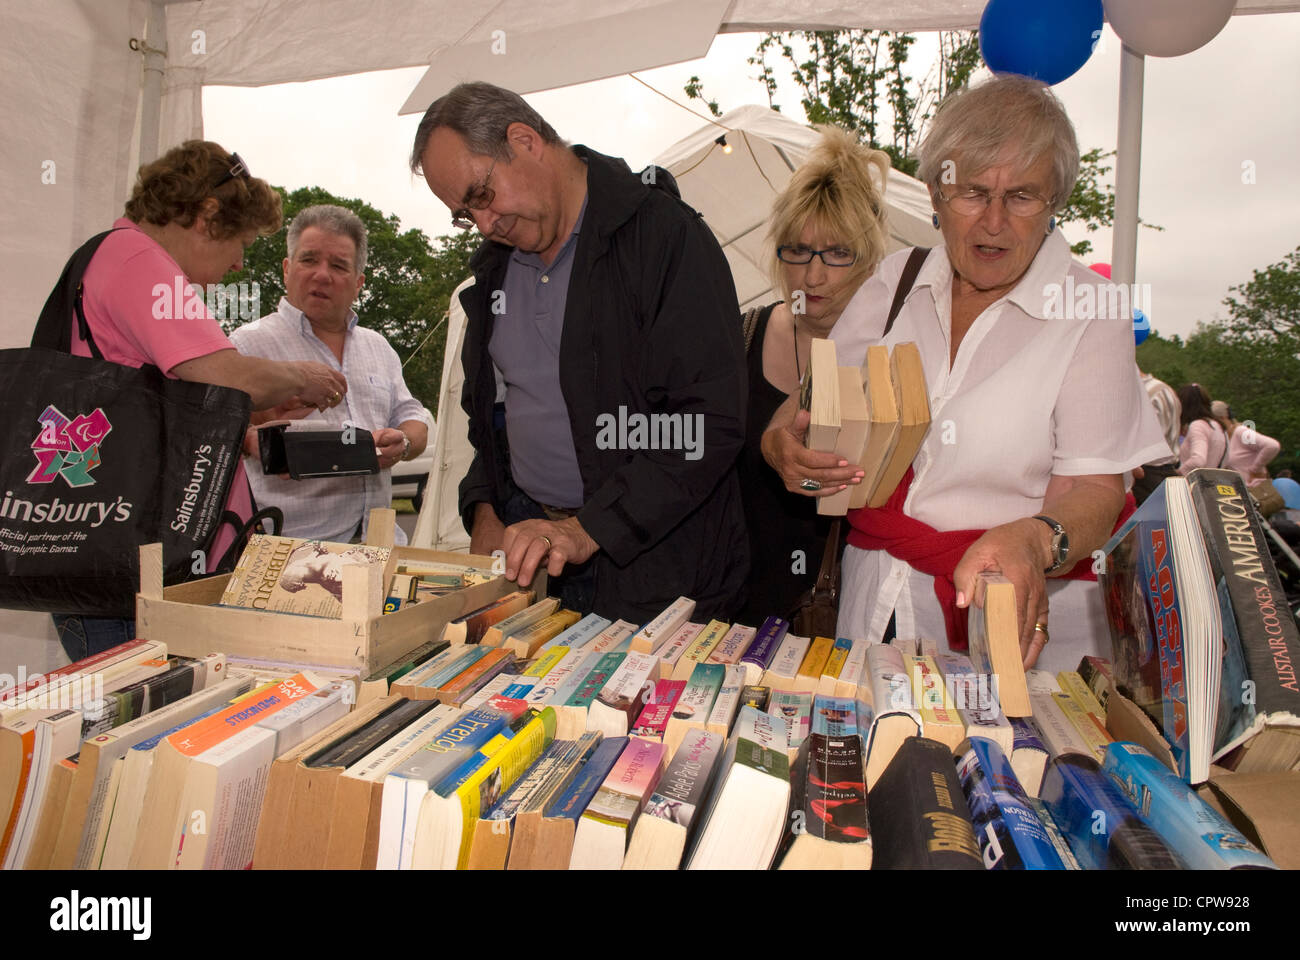 People perusing book stall at Dockenfield fete & Diamond Jubilee celebration day, Dockenfield, Surrey, UK. - Stock Image